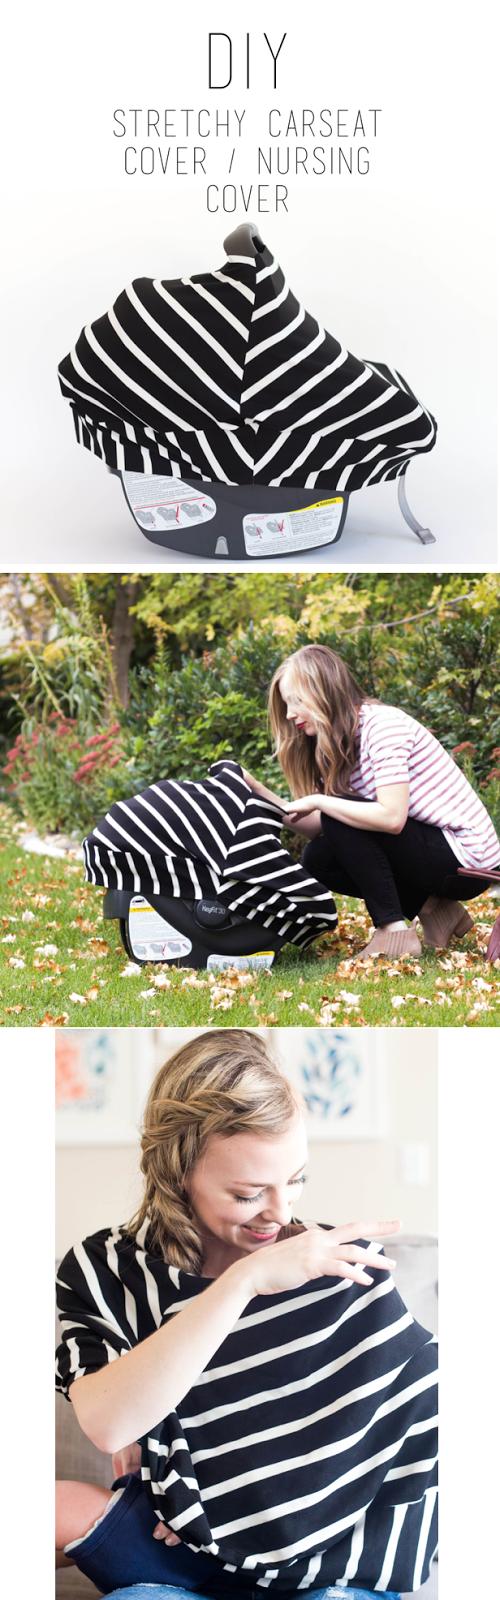 Video Tutorial Stretchy Car Seat Cover Nursing Cover